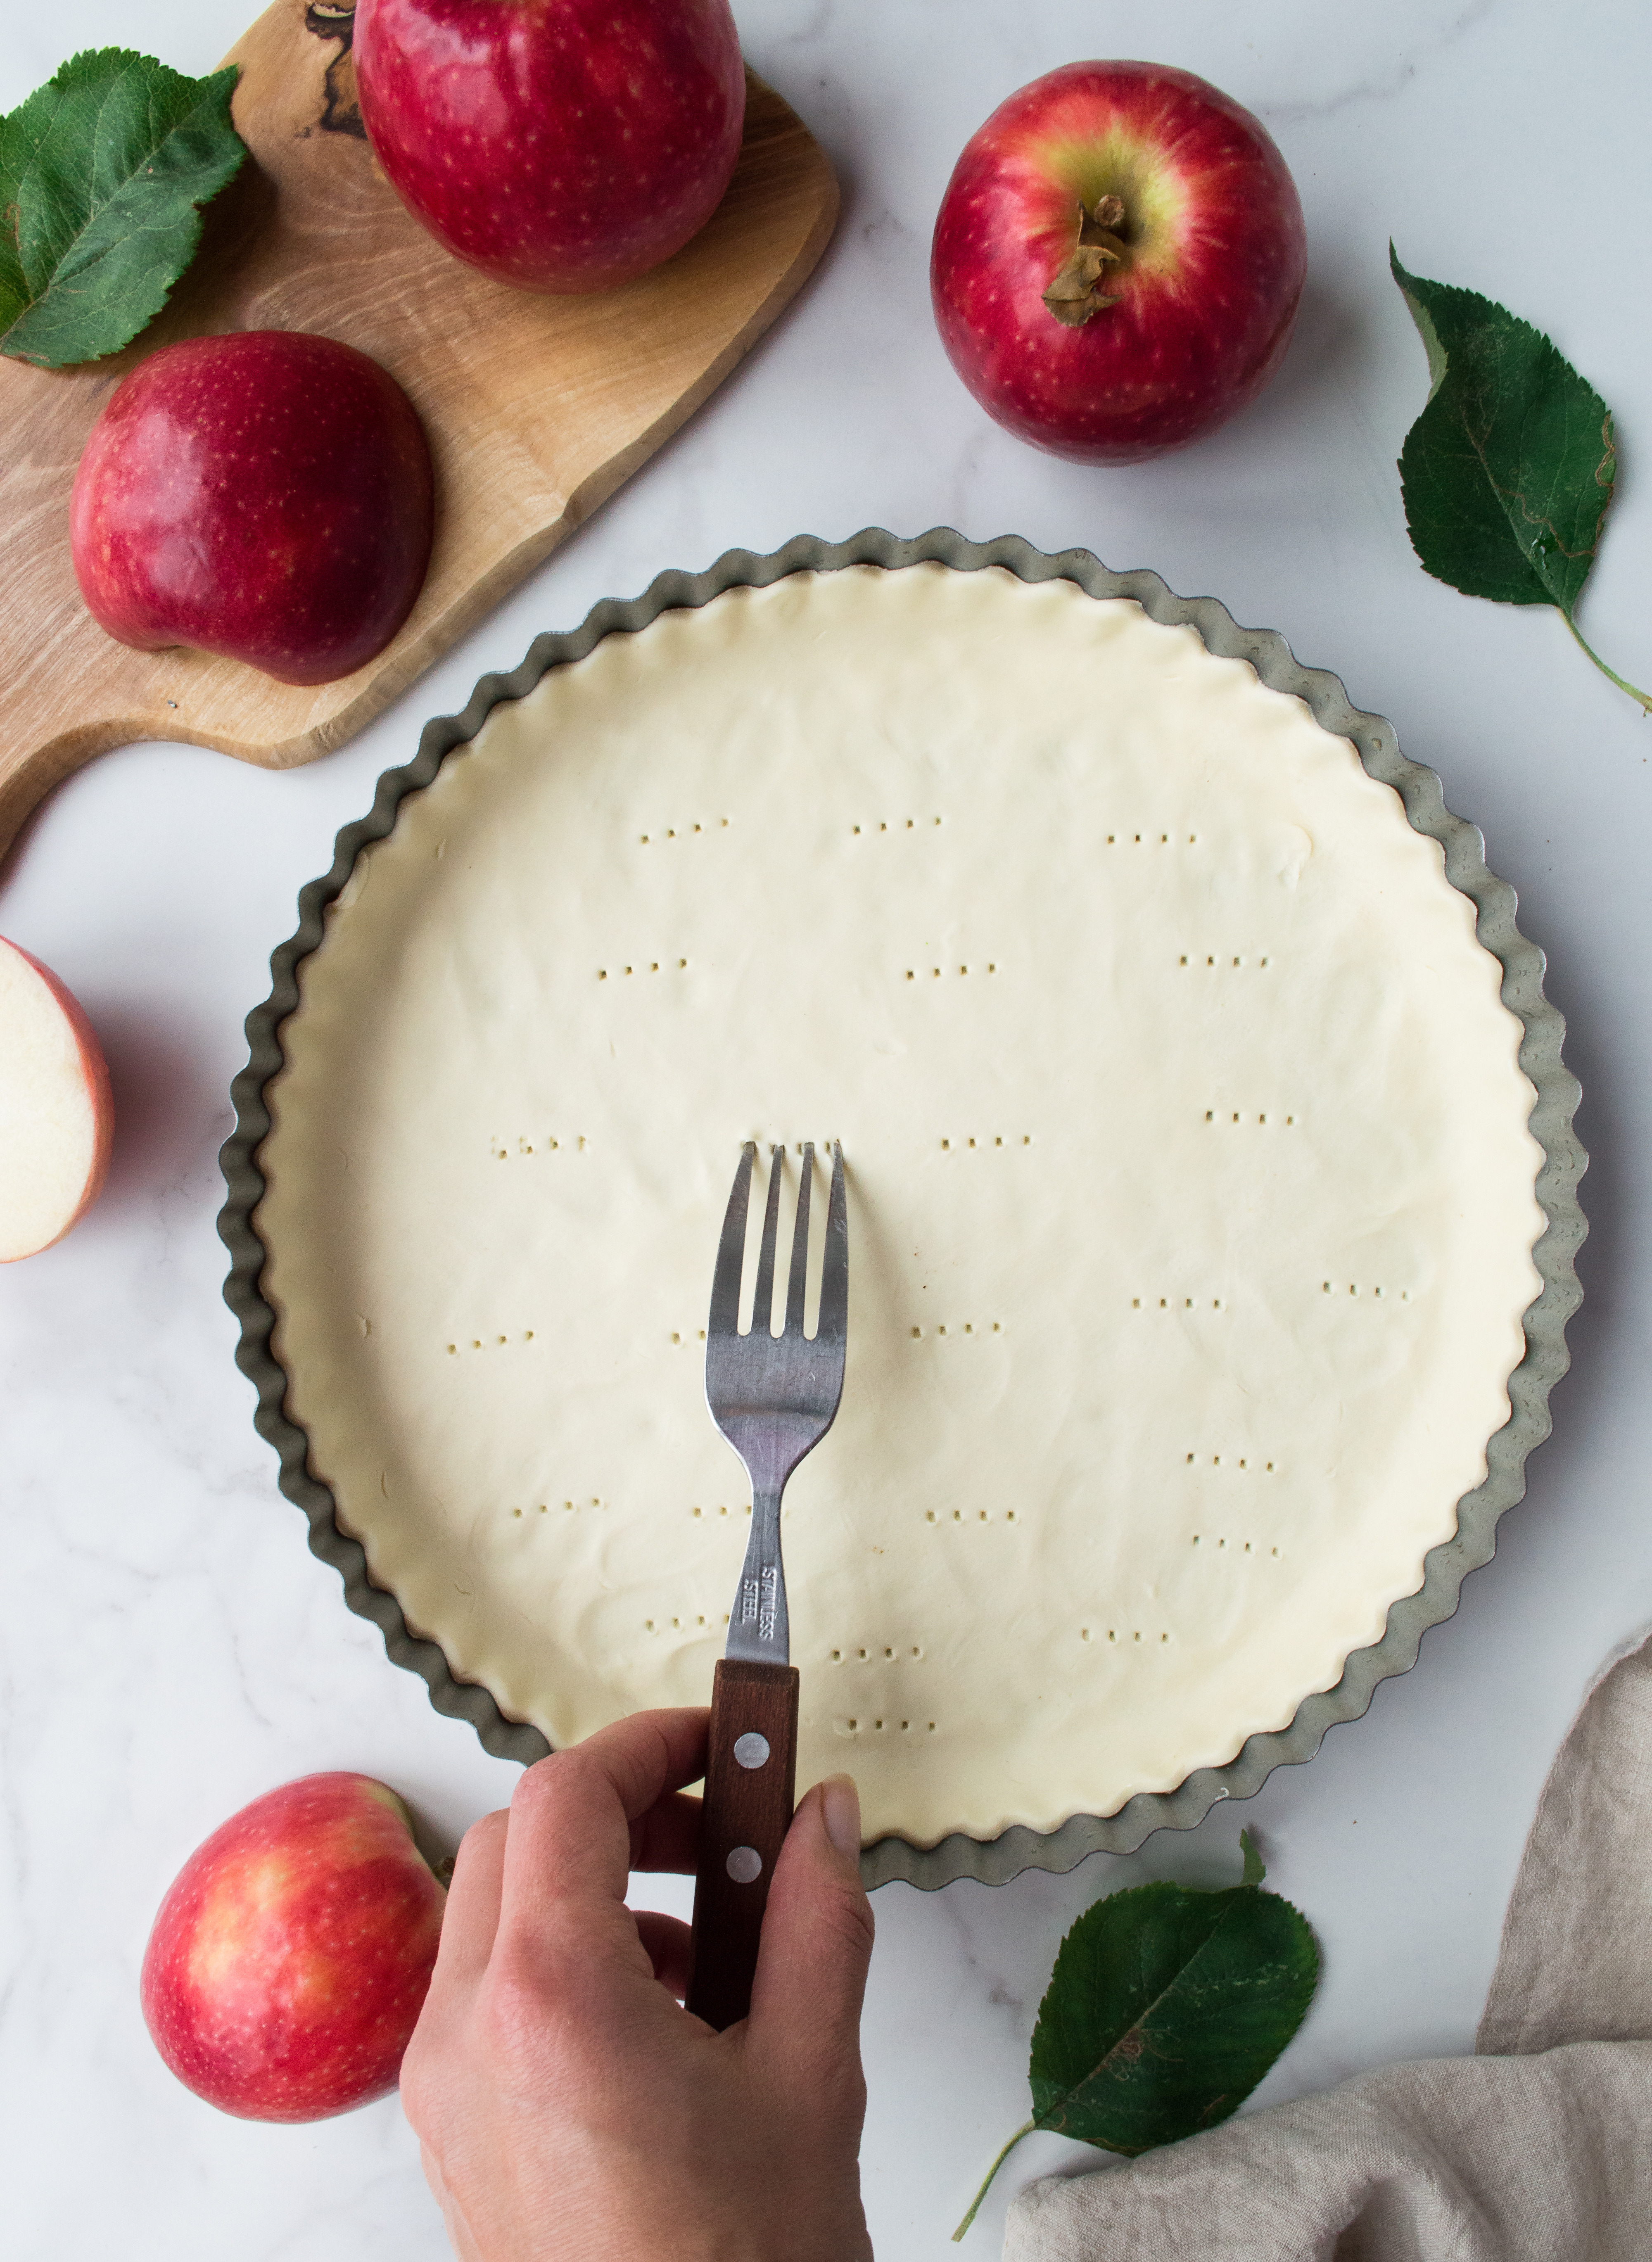 Making of apple tart